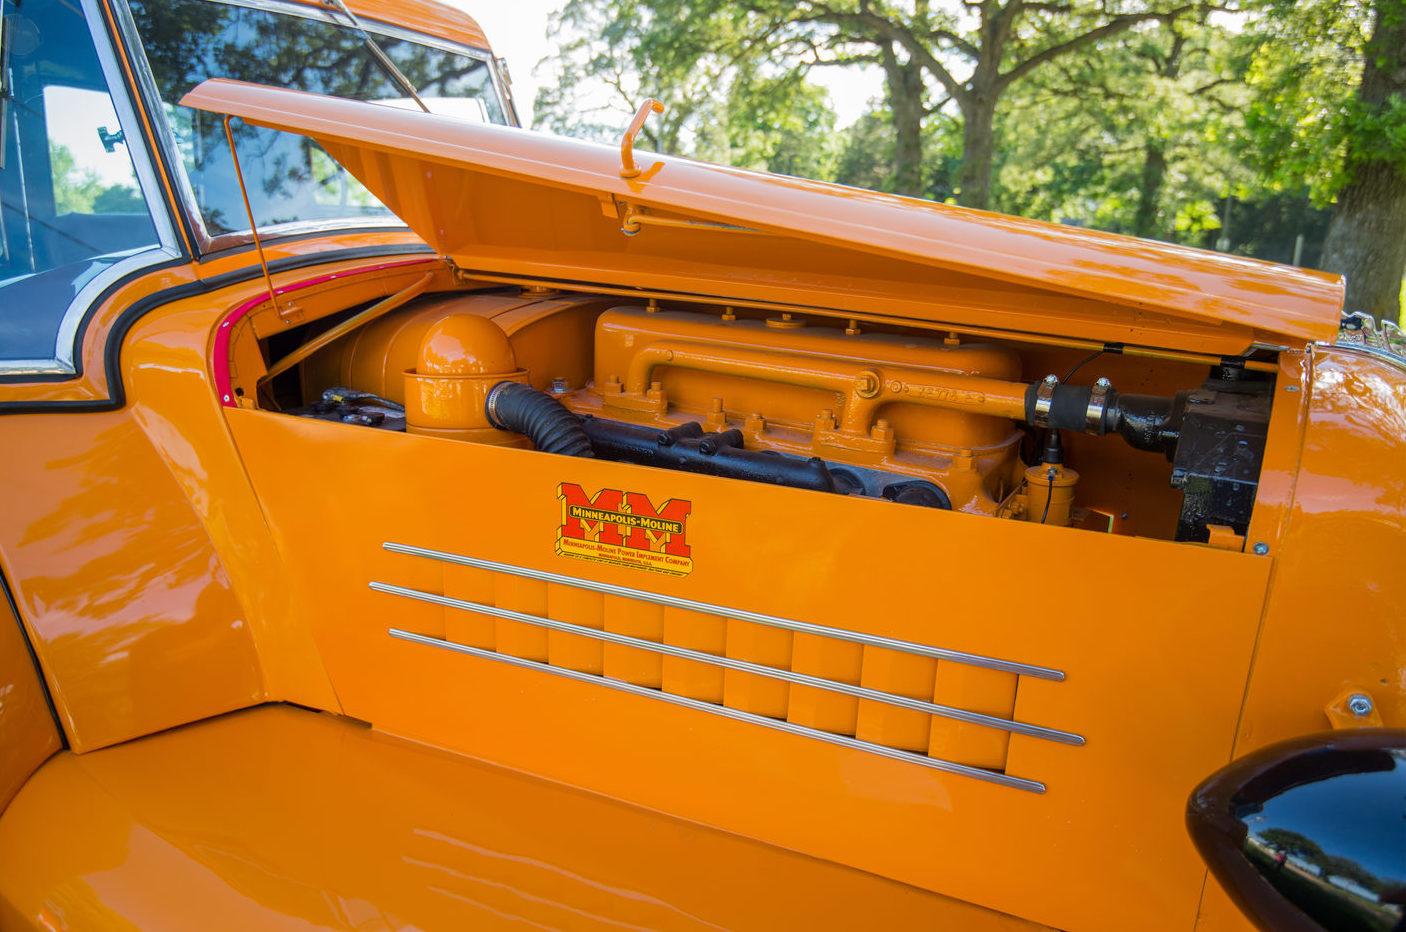 1938 Minneapolis-Moline ULDX Comfortractor Engine passenger side